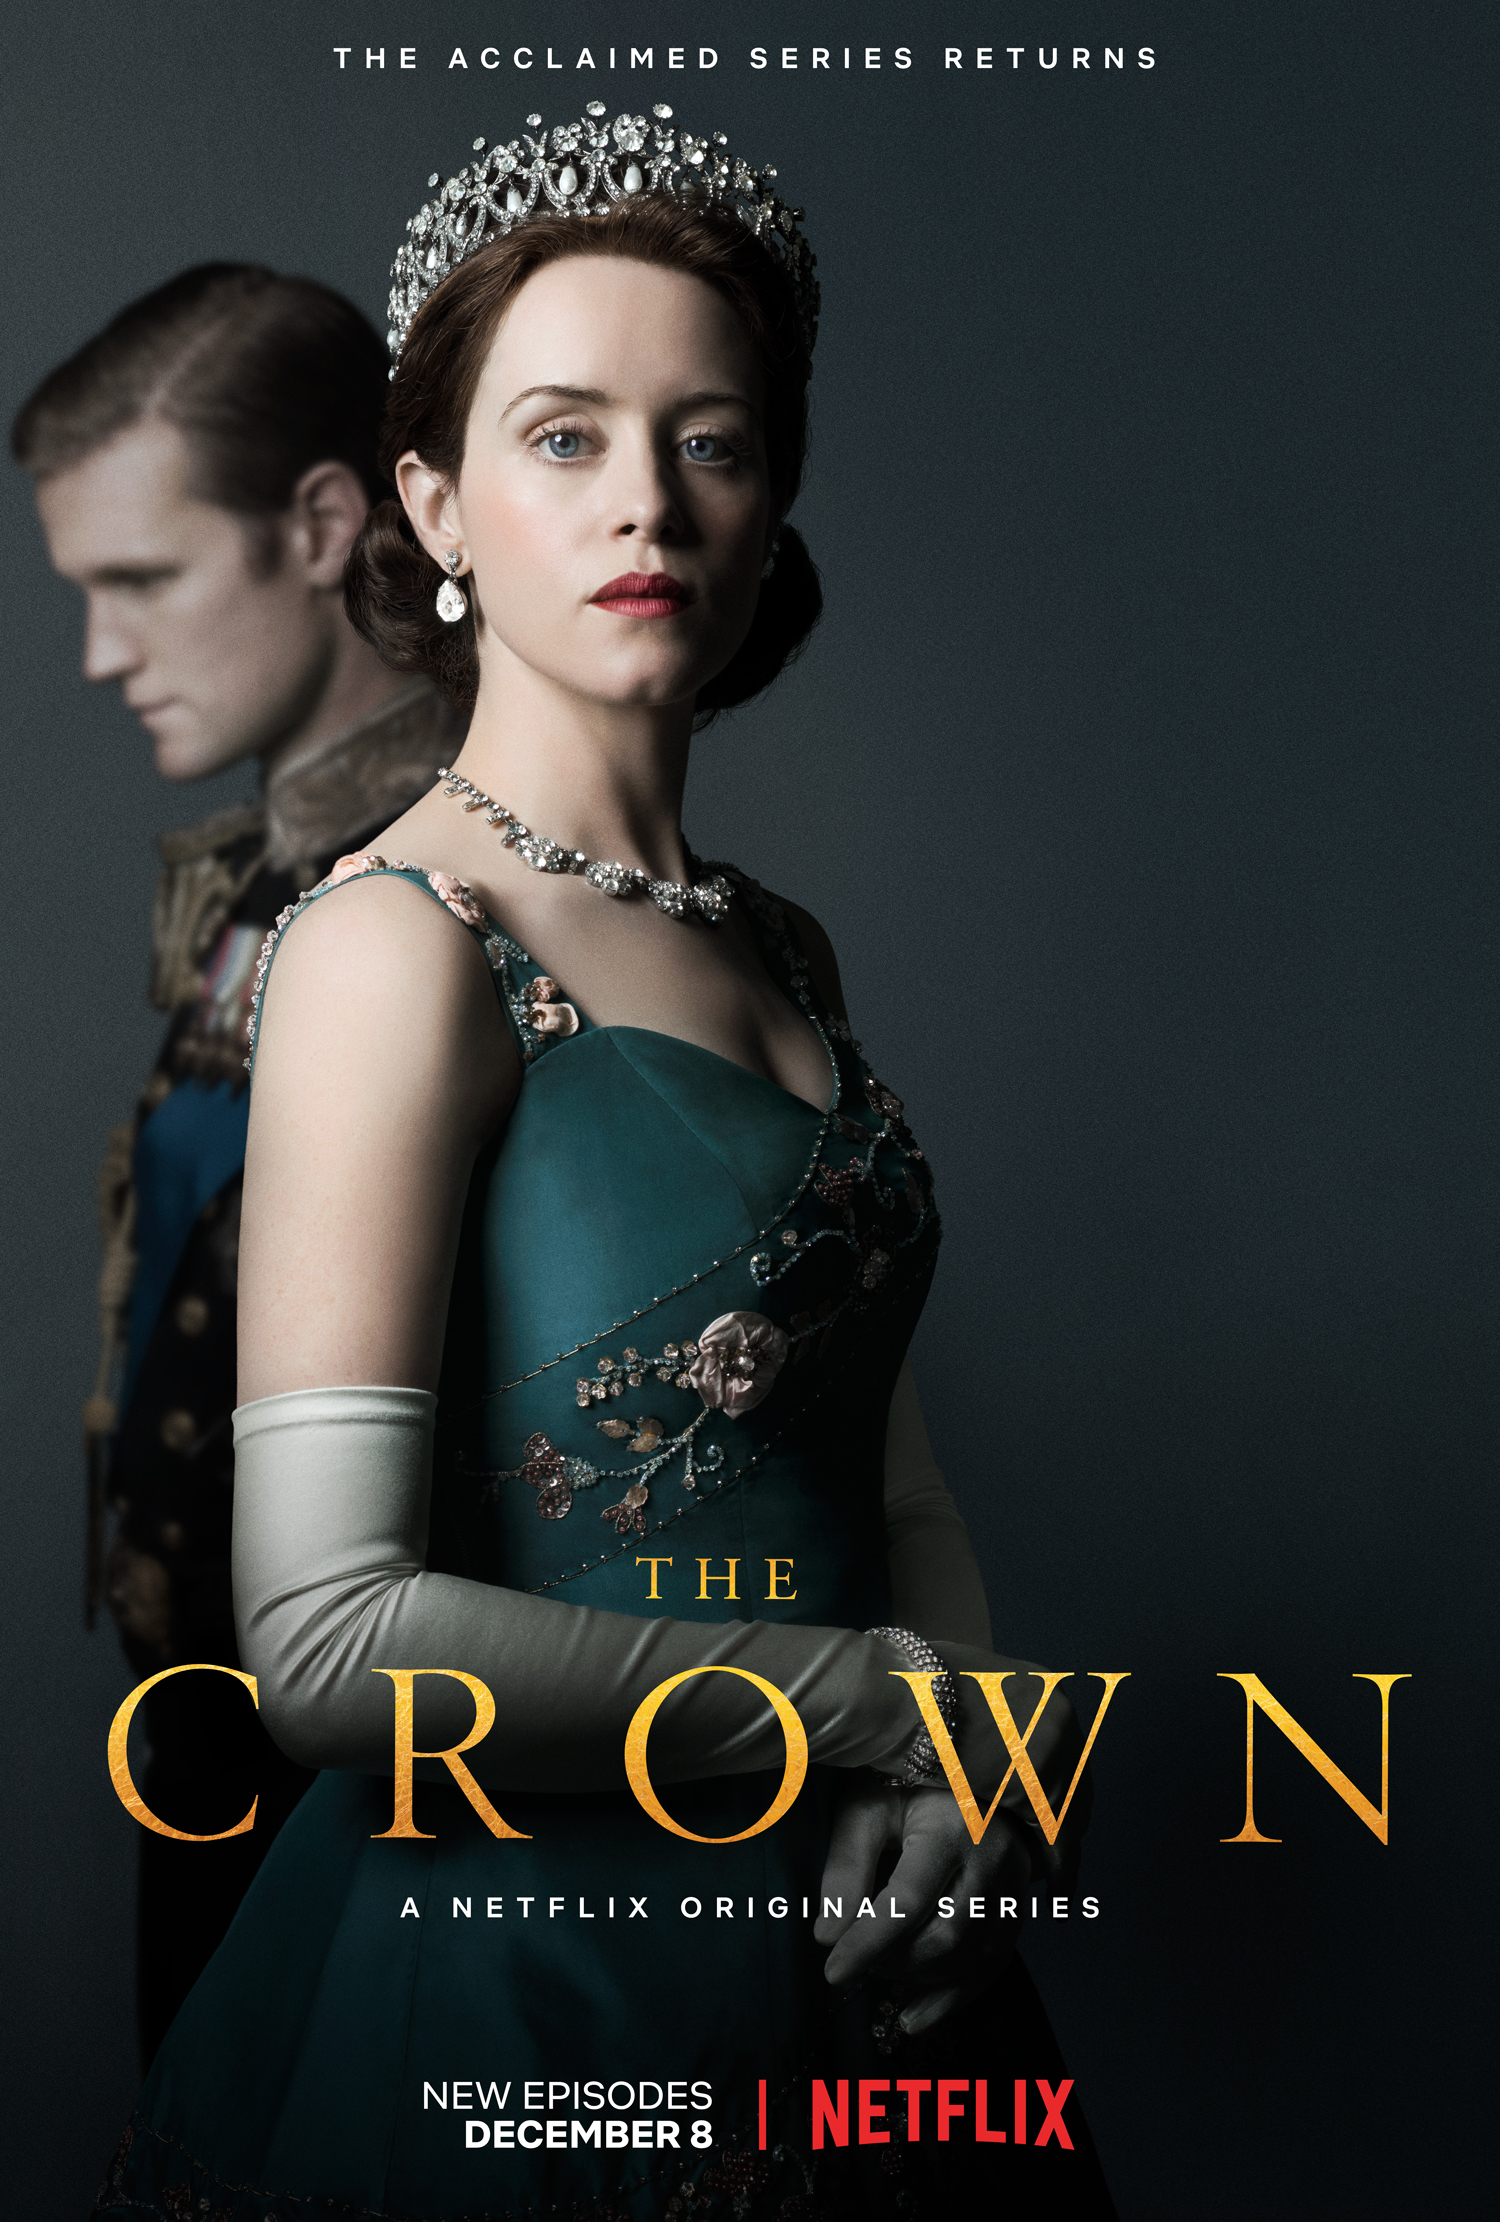 Friday Night at the Movies – The Crown Season 2